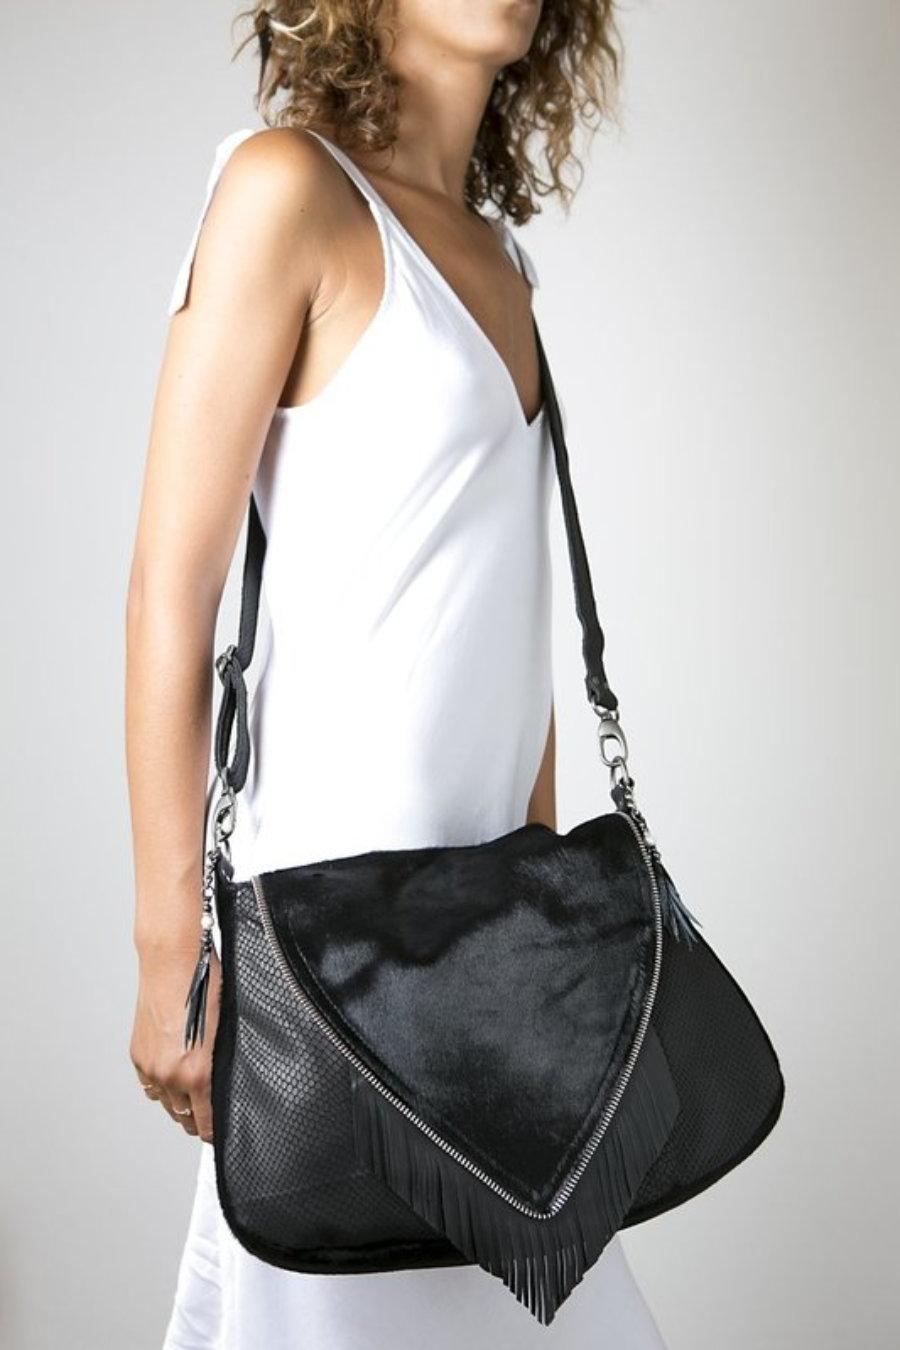 Big Nicole Bag I - one of our signature black leather handmade handbags